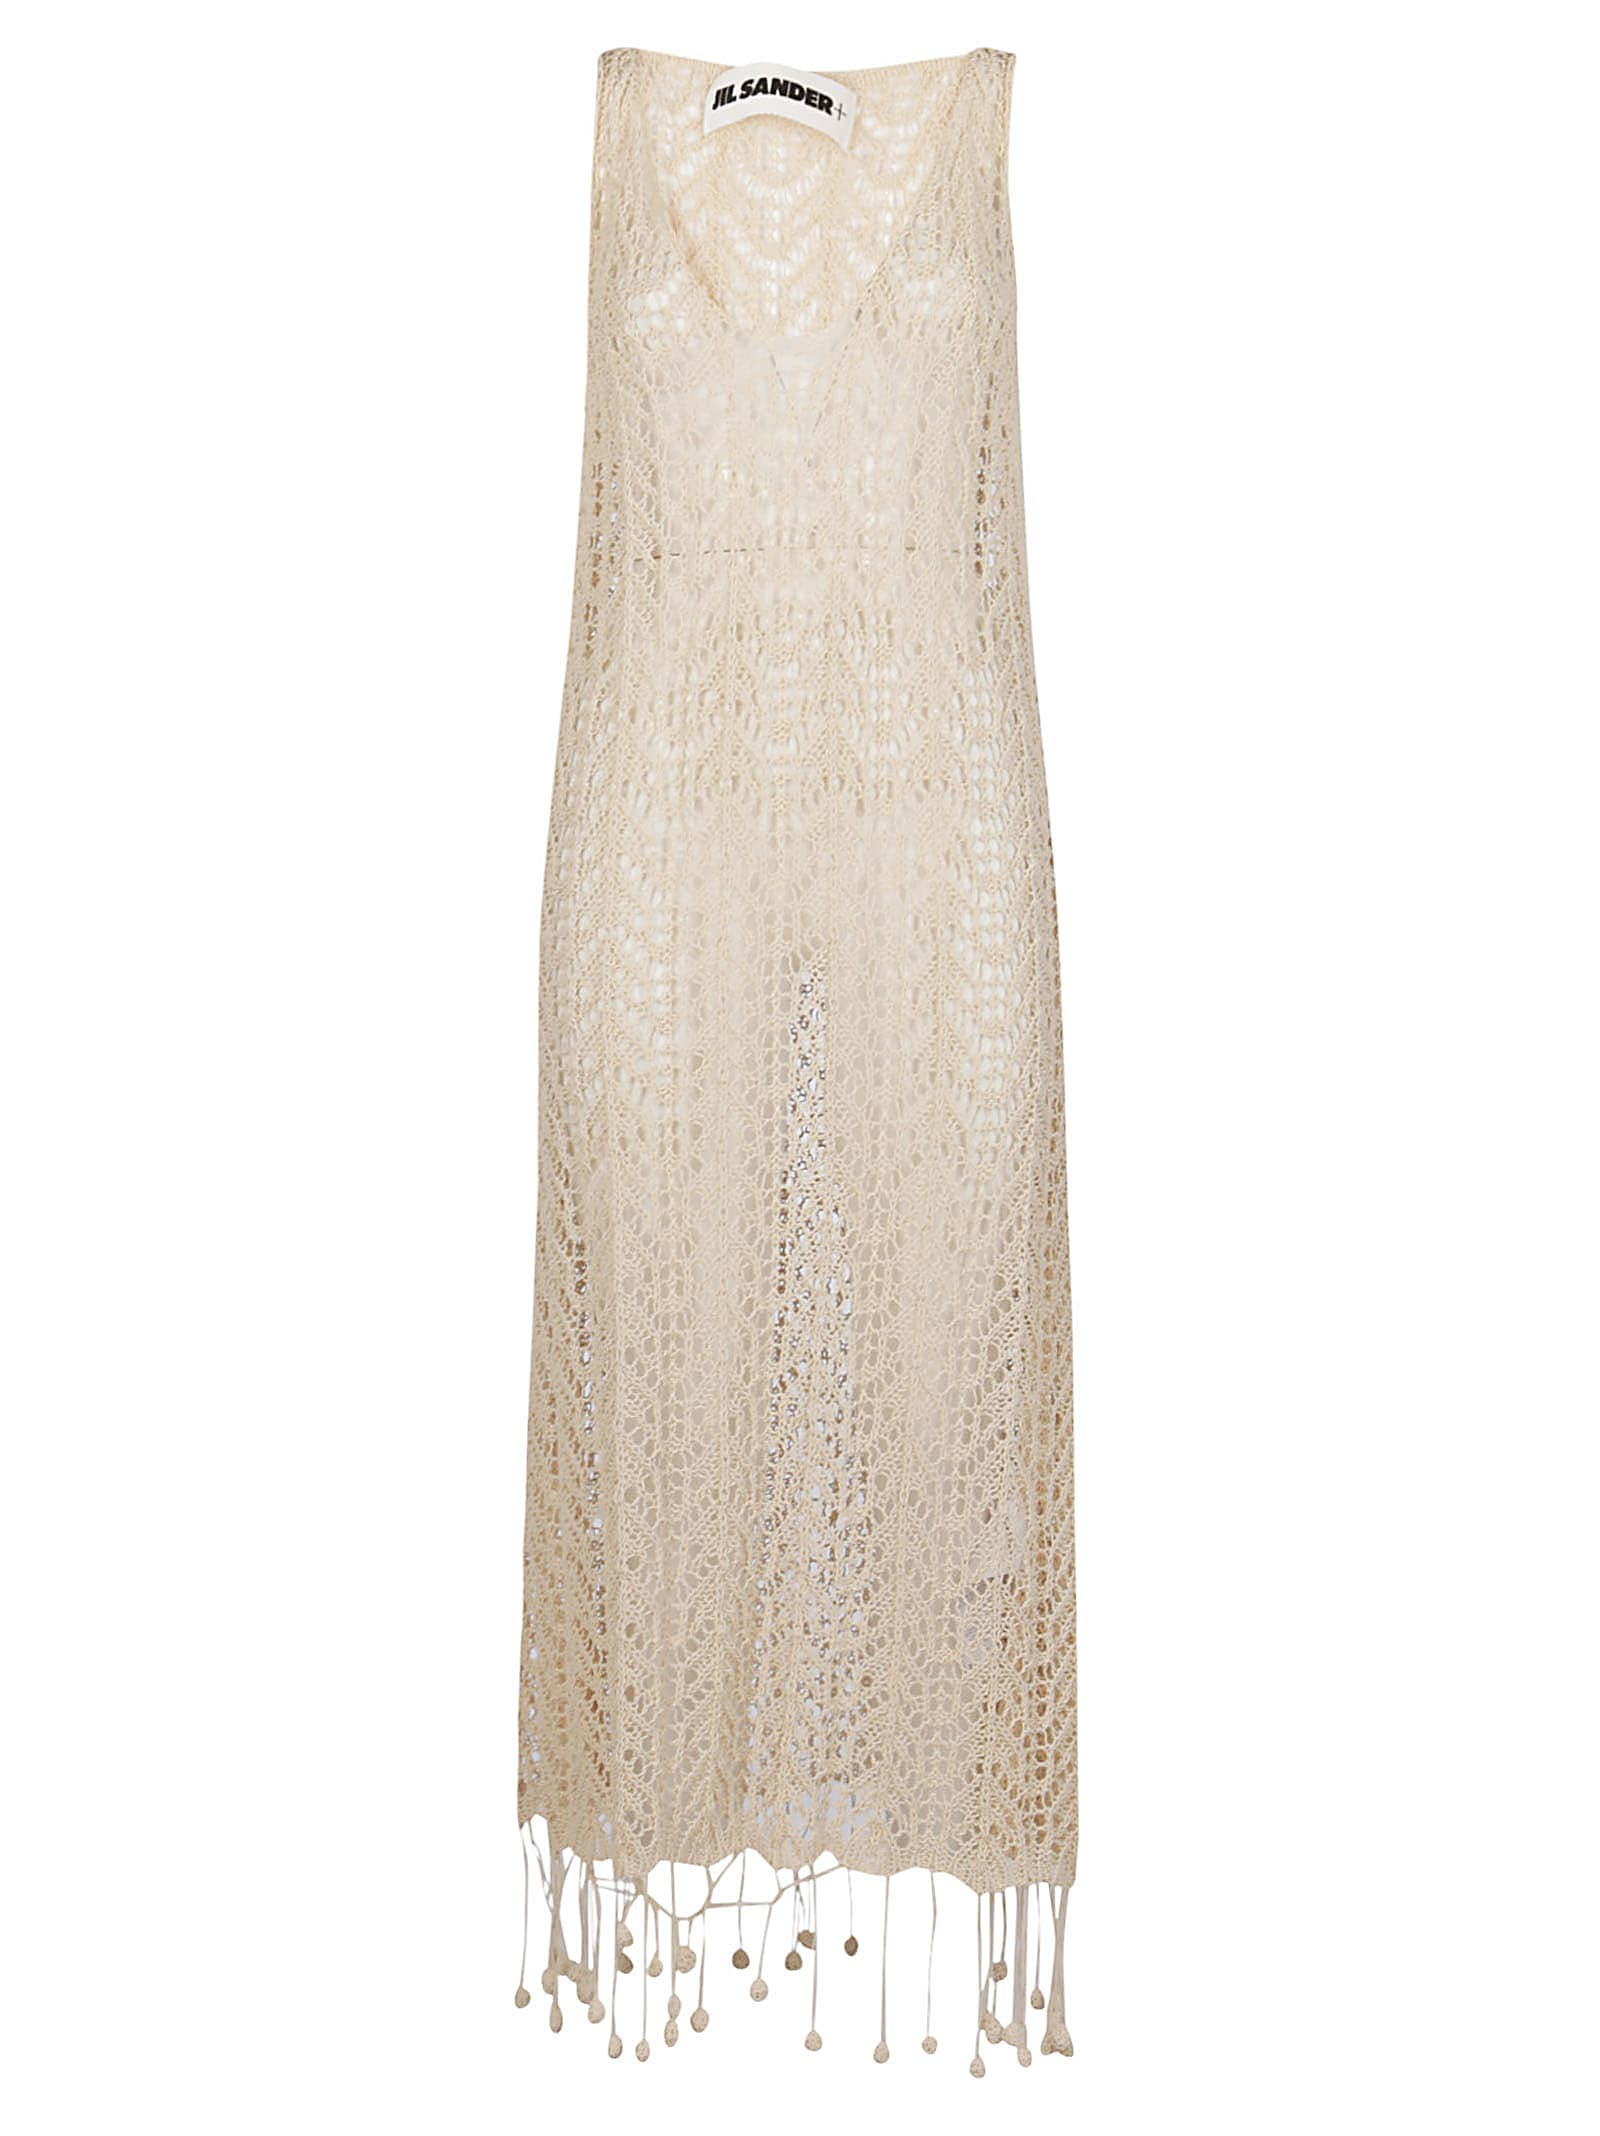 Buy Jil Sander Nude Cotton Dress online, shop Jil Sander with free shipping